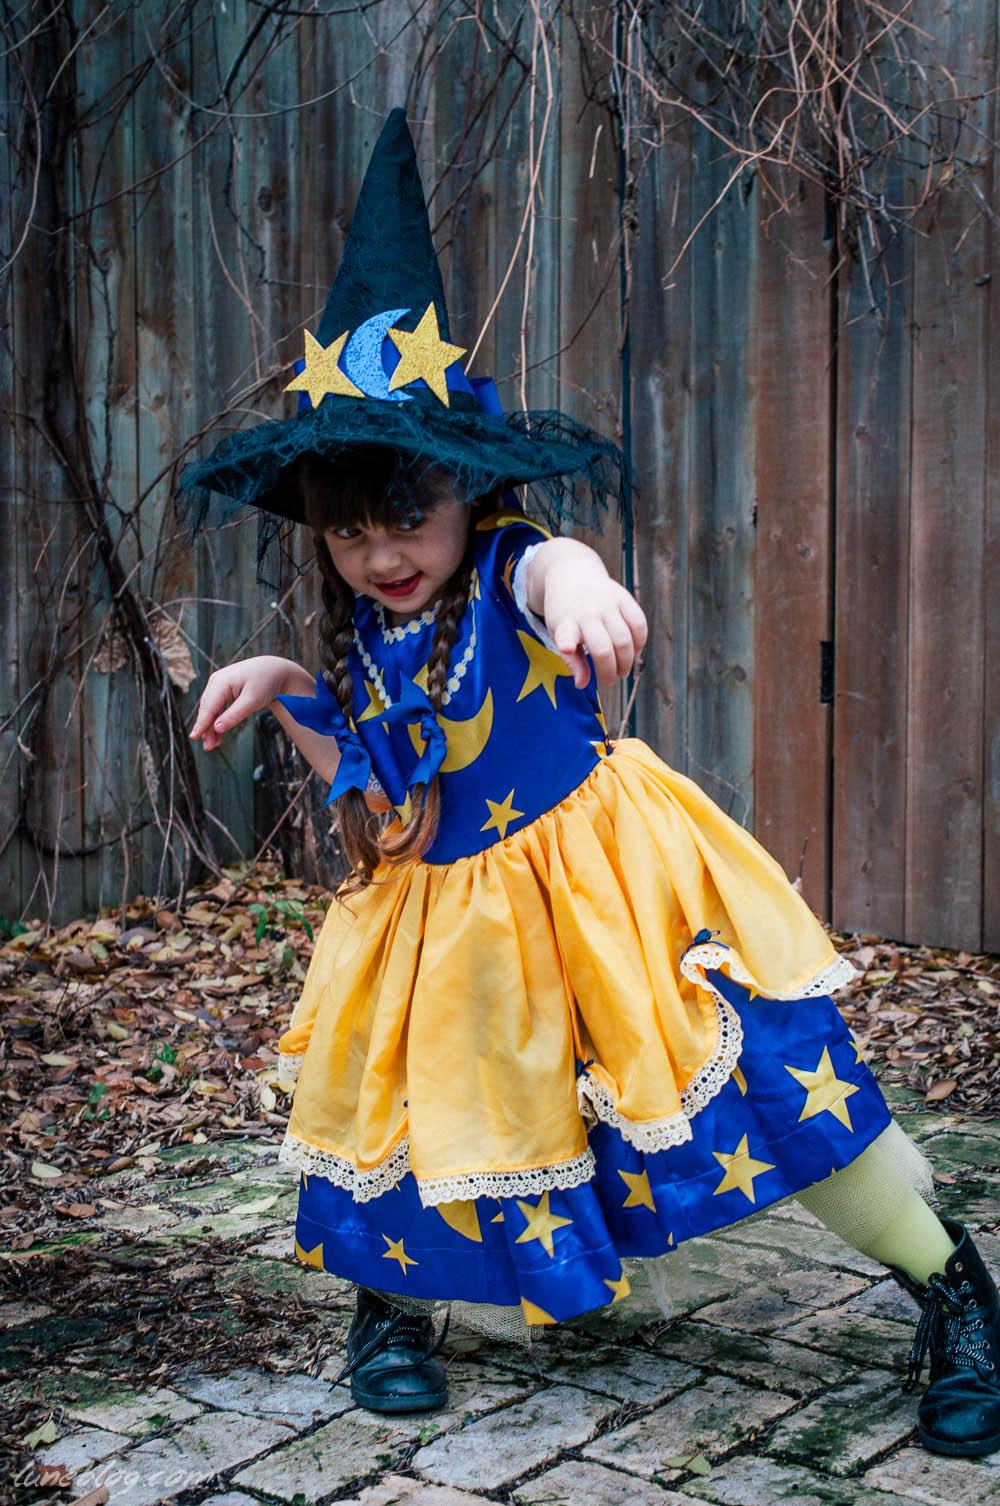 halloween costumes 2015 lune travels blog (19 of 39).jpg